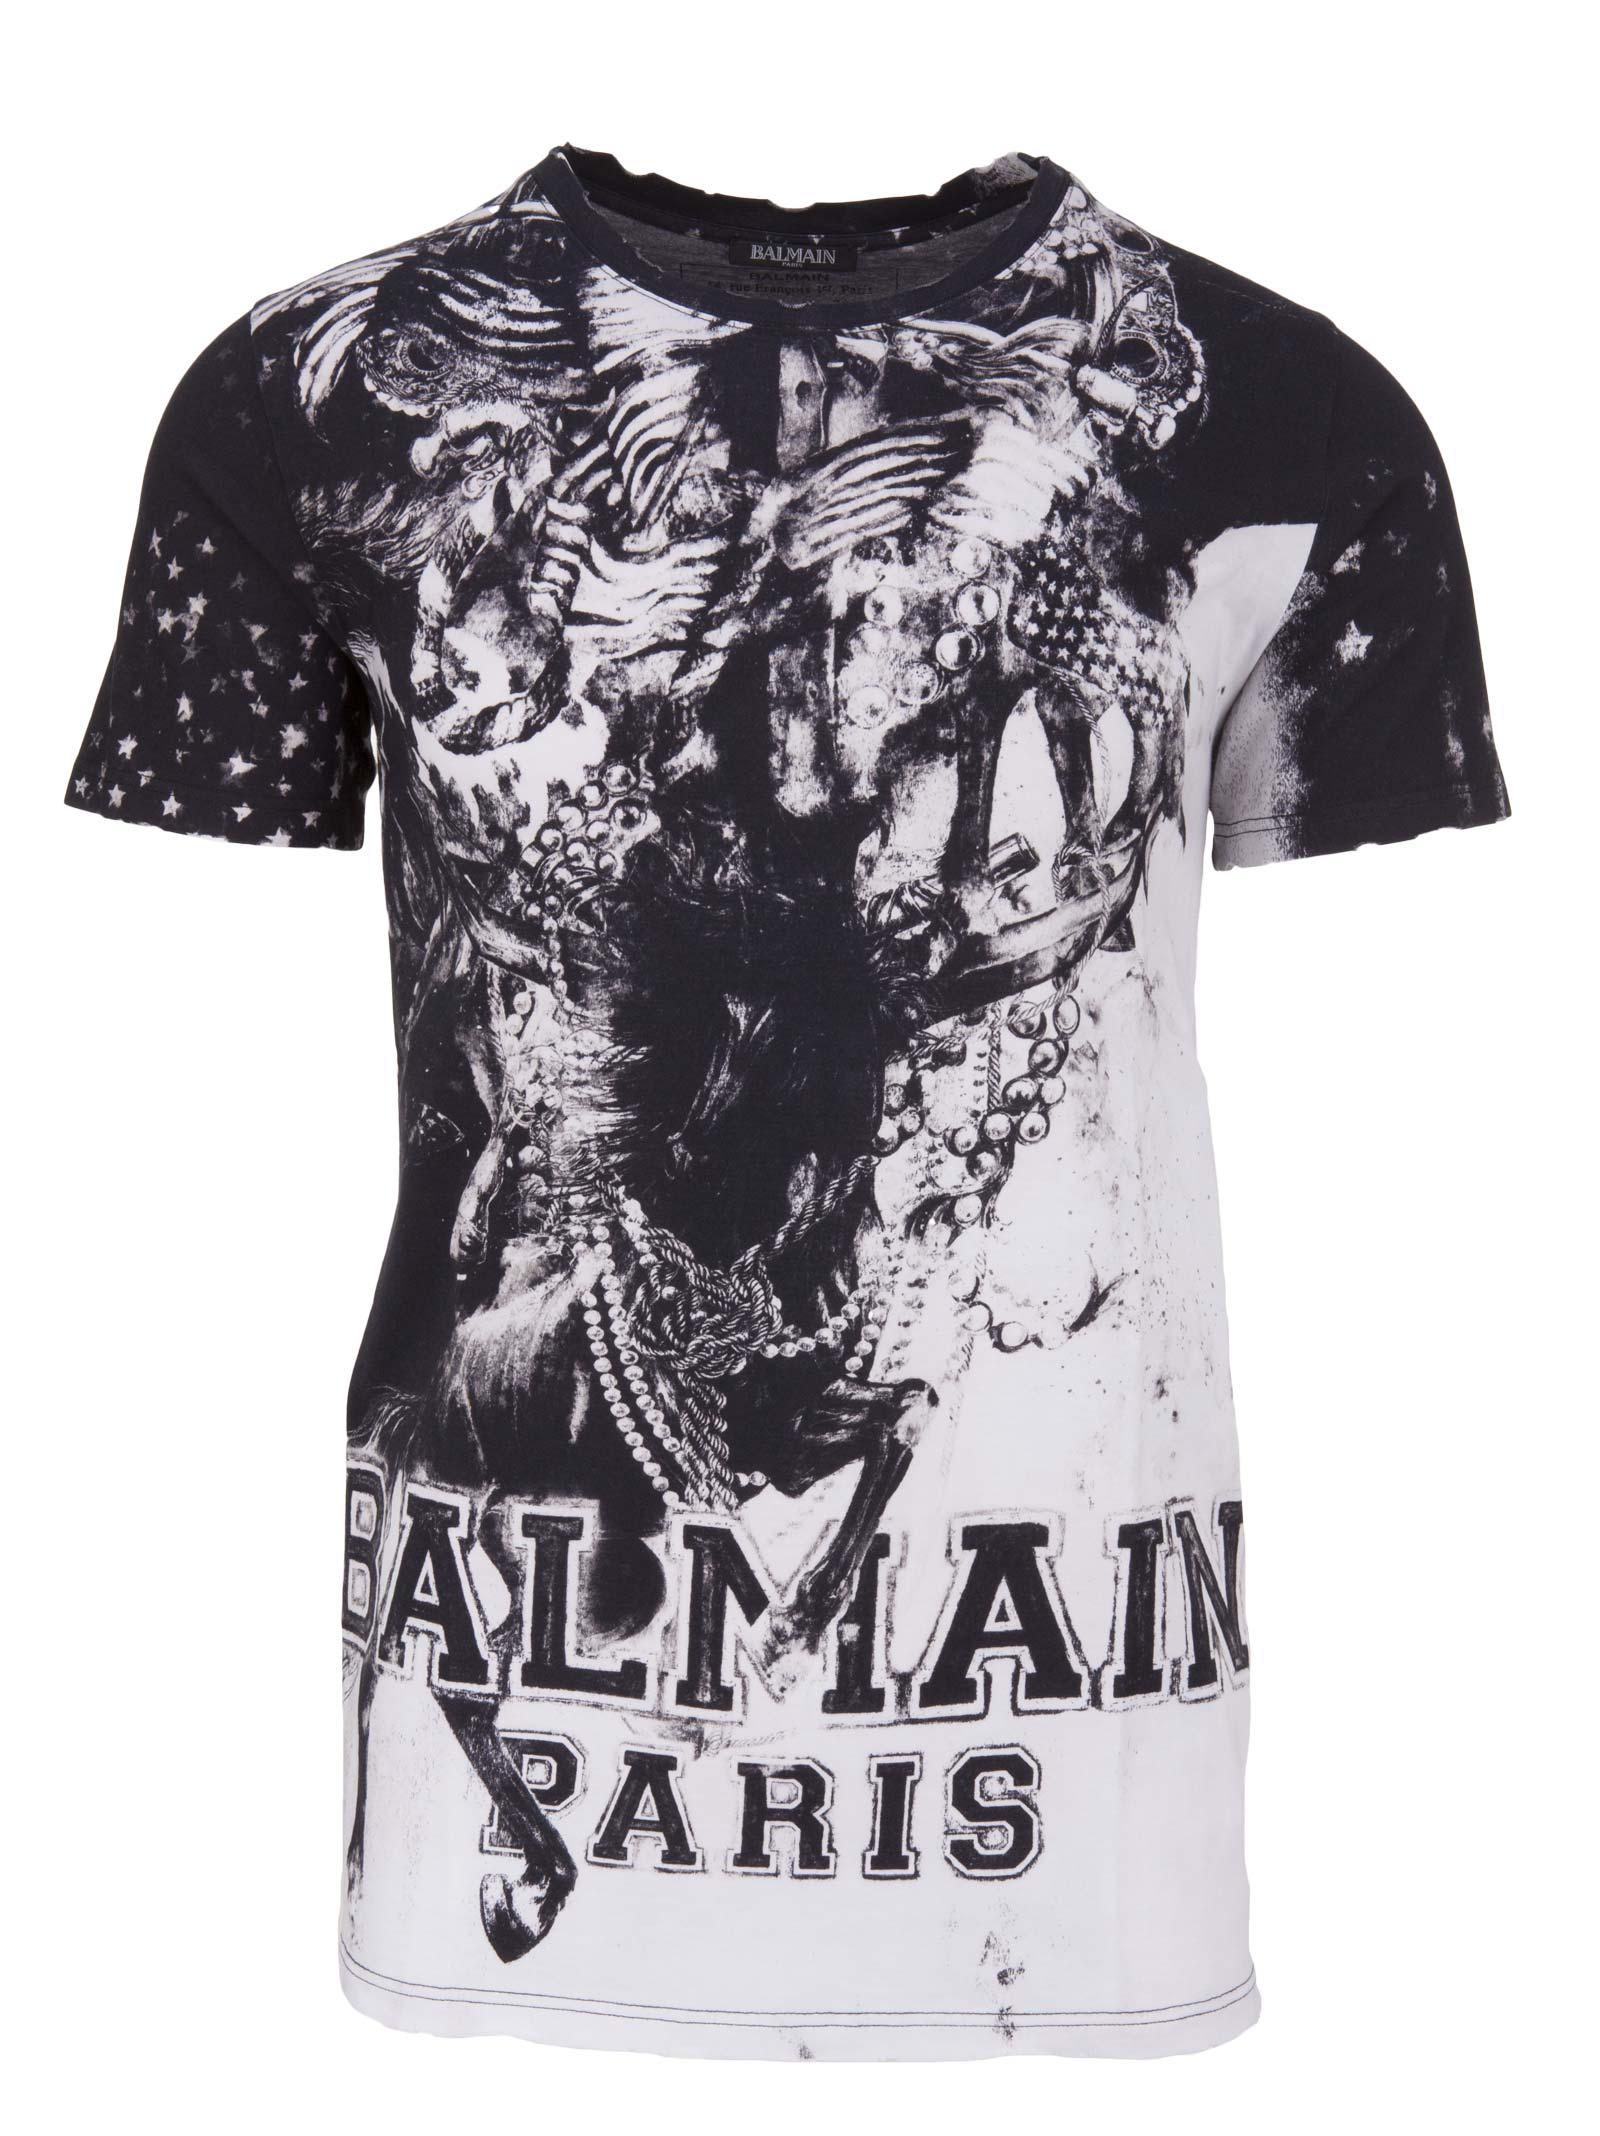 balmain balmain paris t shirt nero bianco men 39 s short sleeve t shirts italist. Black Bedroom Furniture Sets. Home Design Ideas